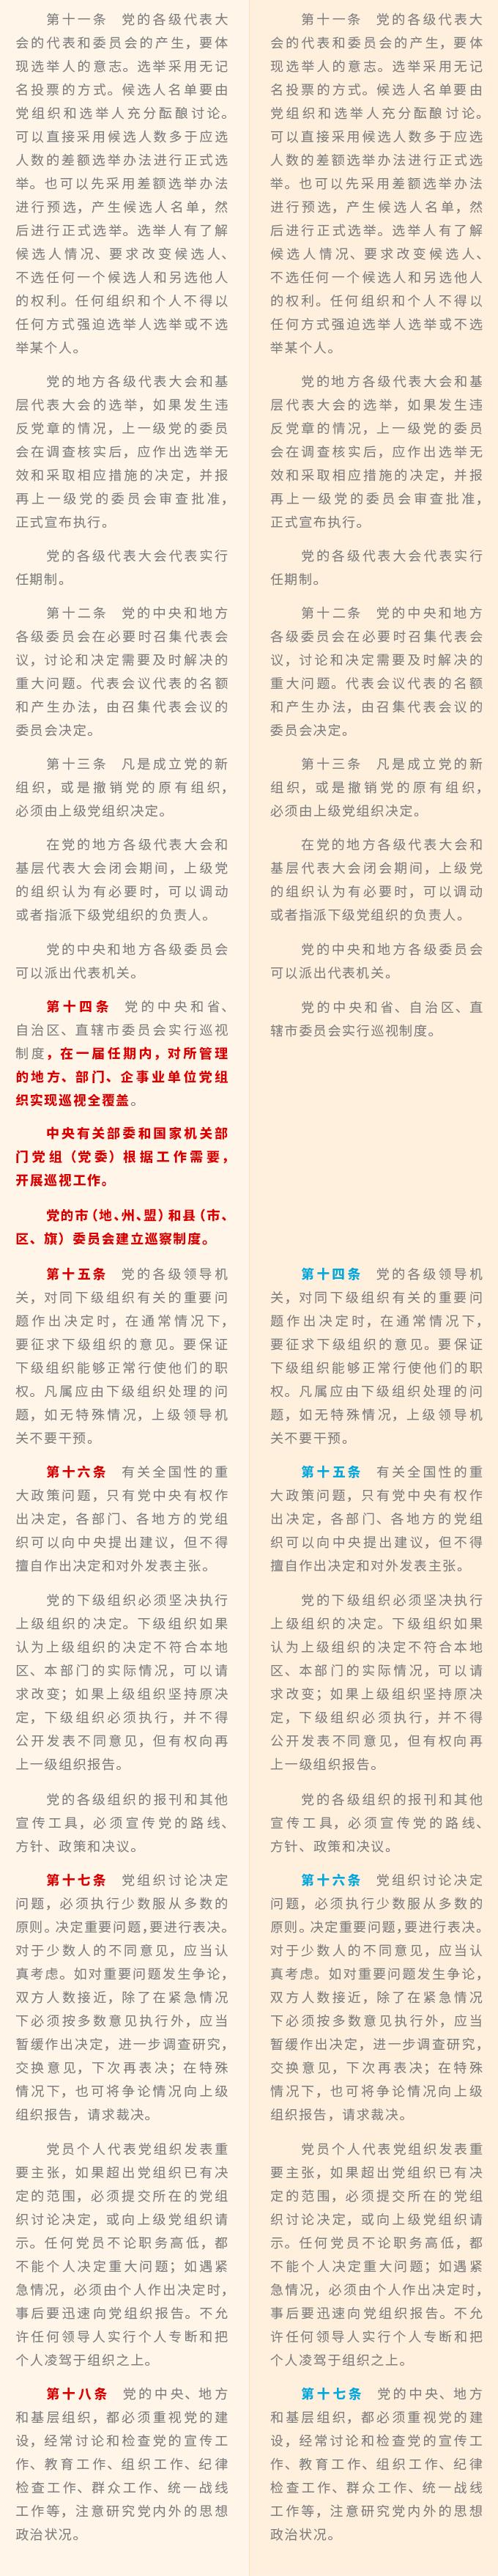 http://www.ccdi.gov.cn/yw/201710/W020171031664657841362.png